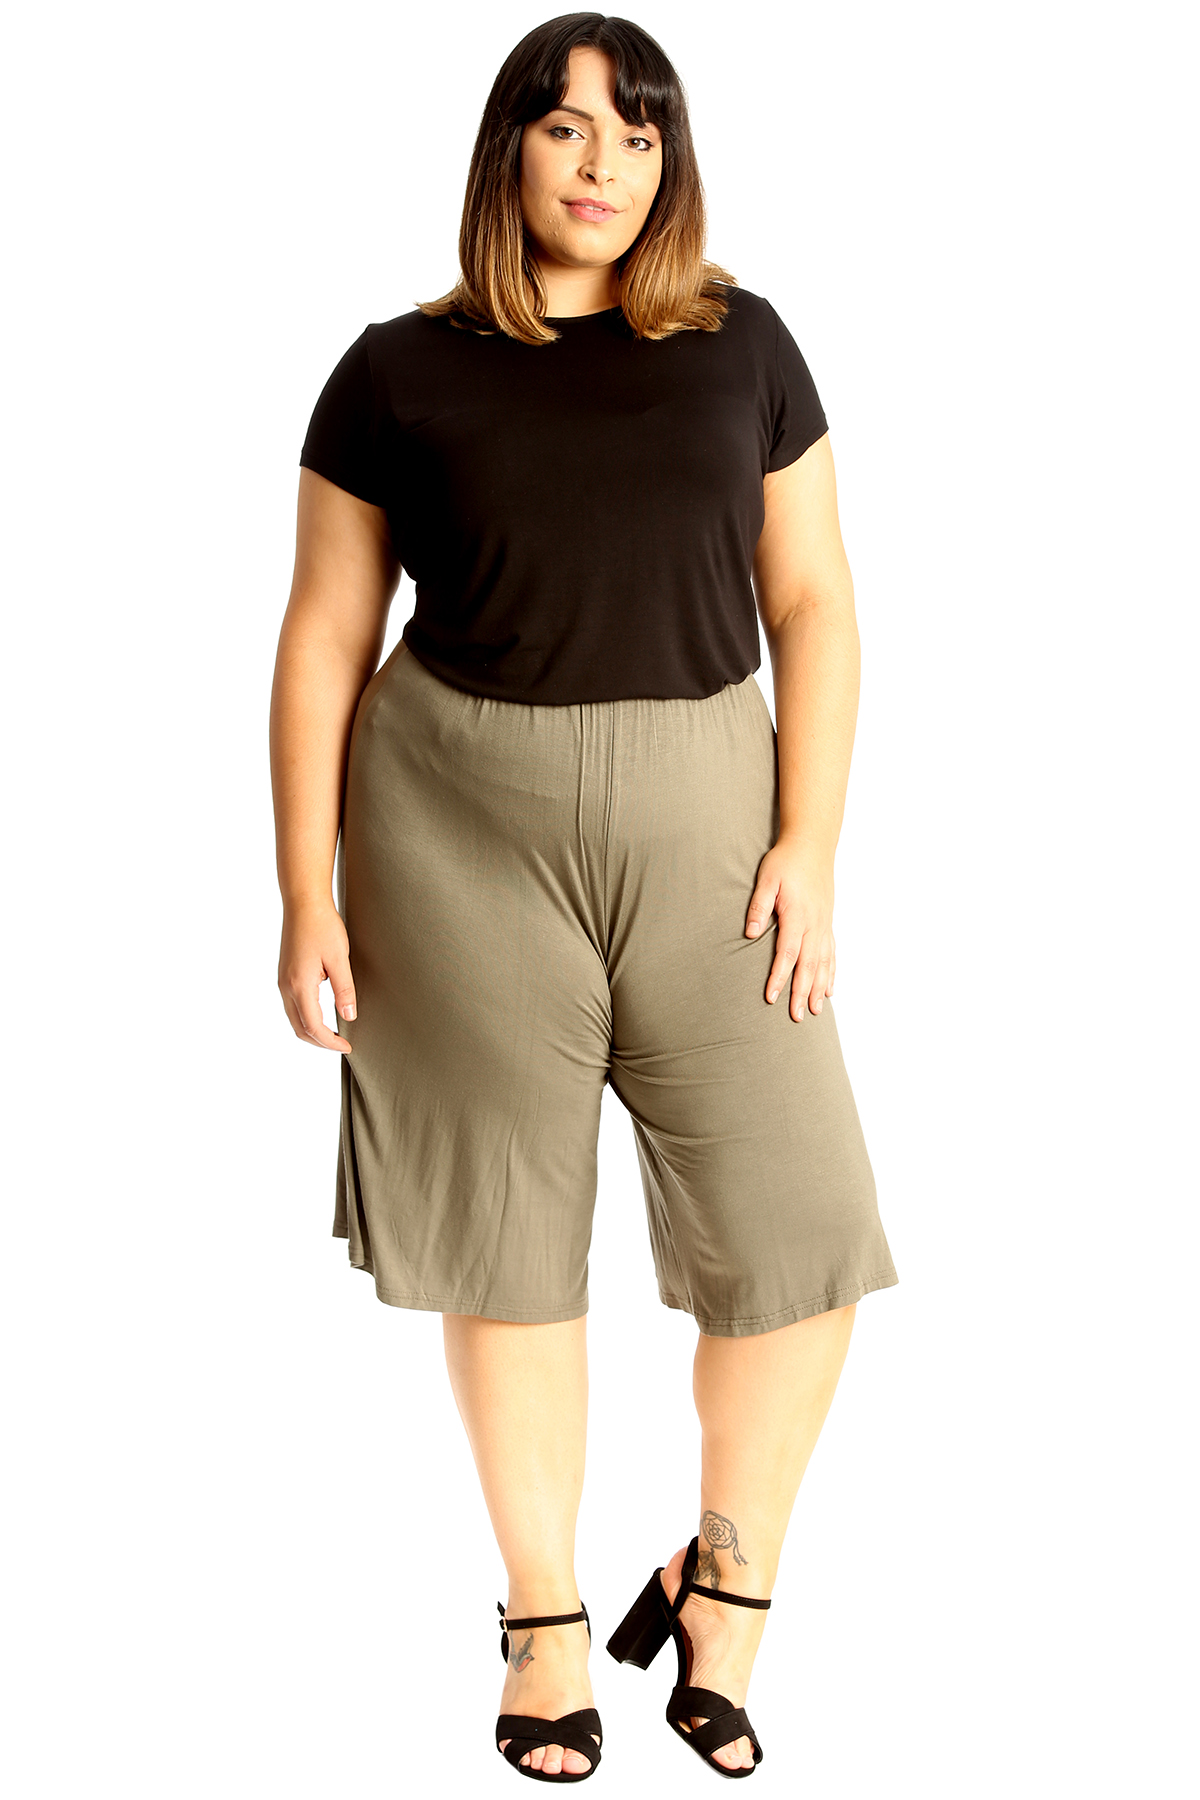 New-Womens-Plus-Size-Culottes-Ladies-Plain-Shorts-Palazzo-Elastic-Pants-Summer thumbnail 54